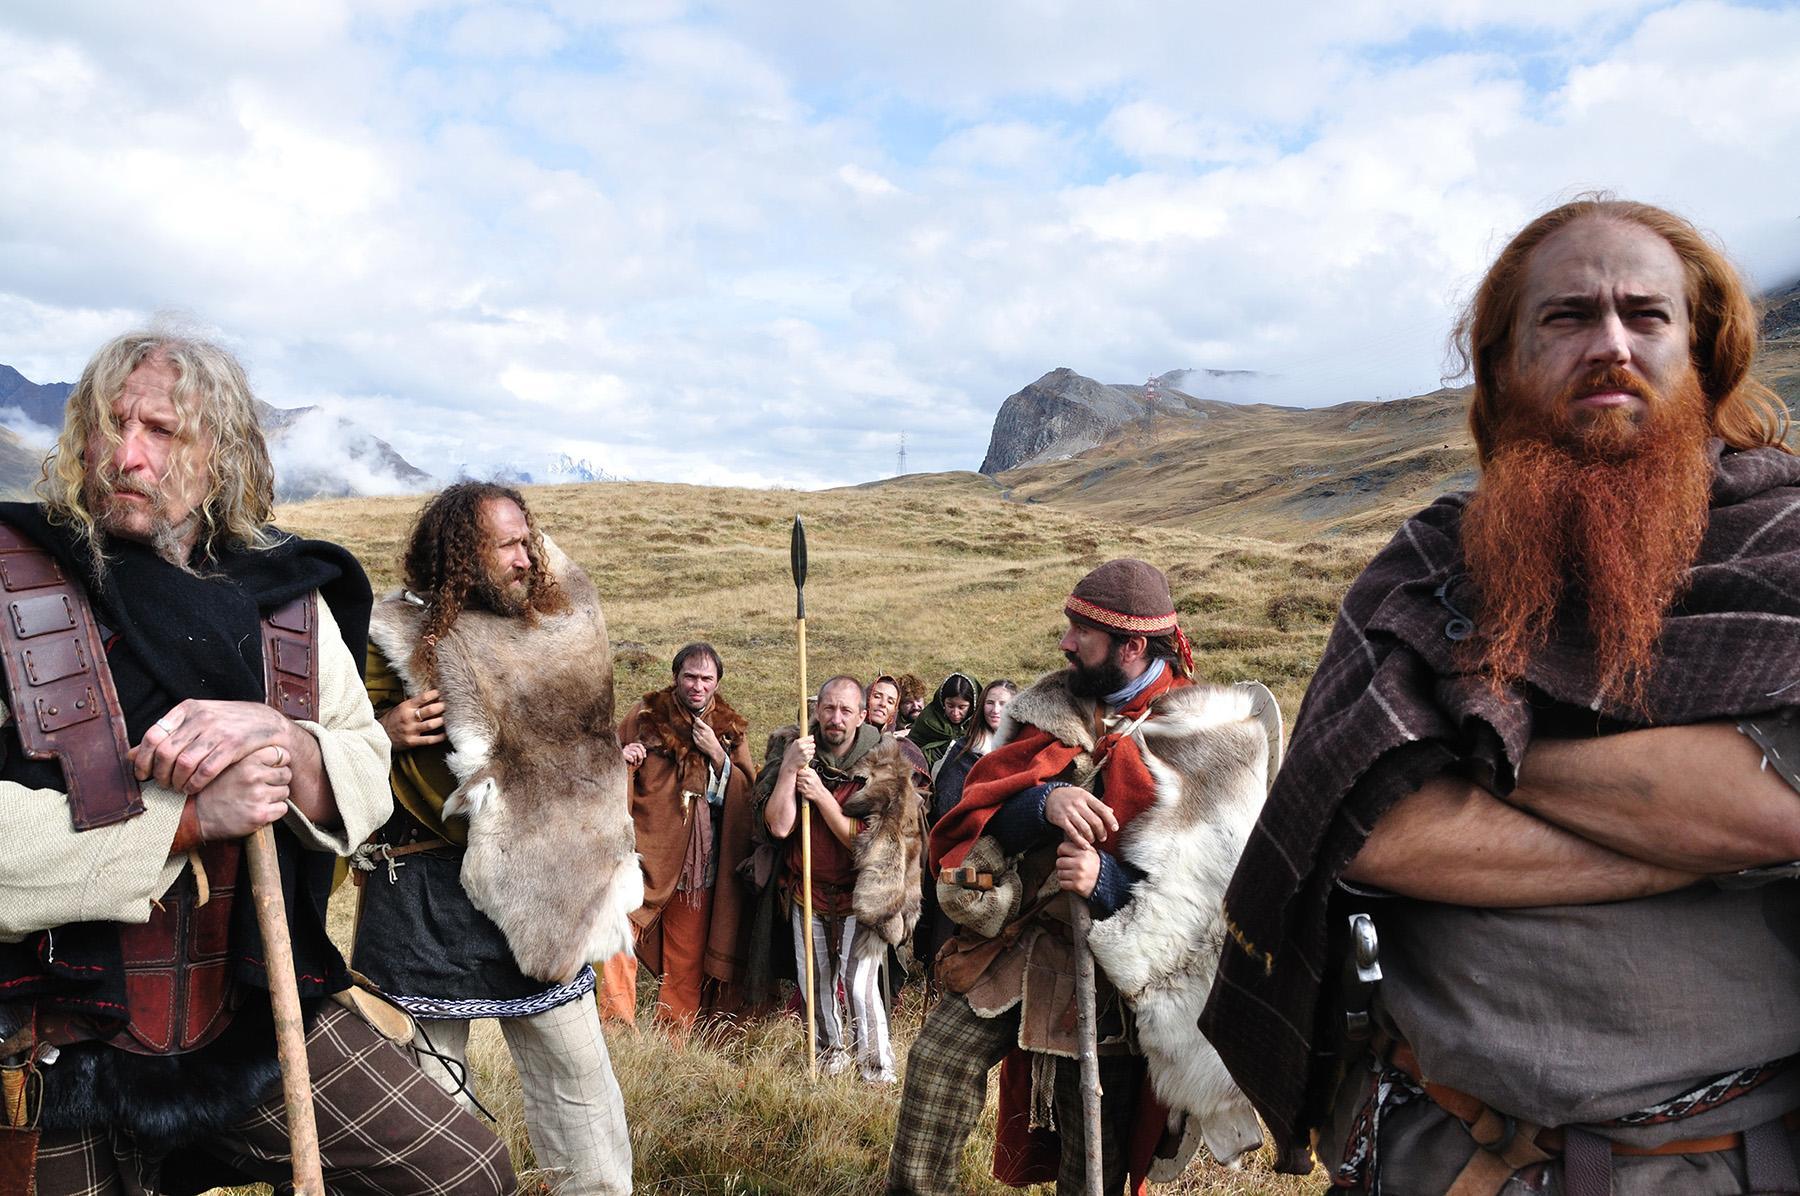 gorlach celti piemonte okelum migrazione